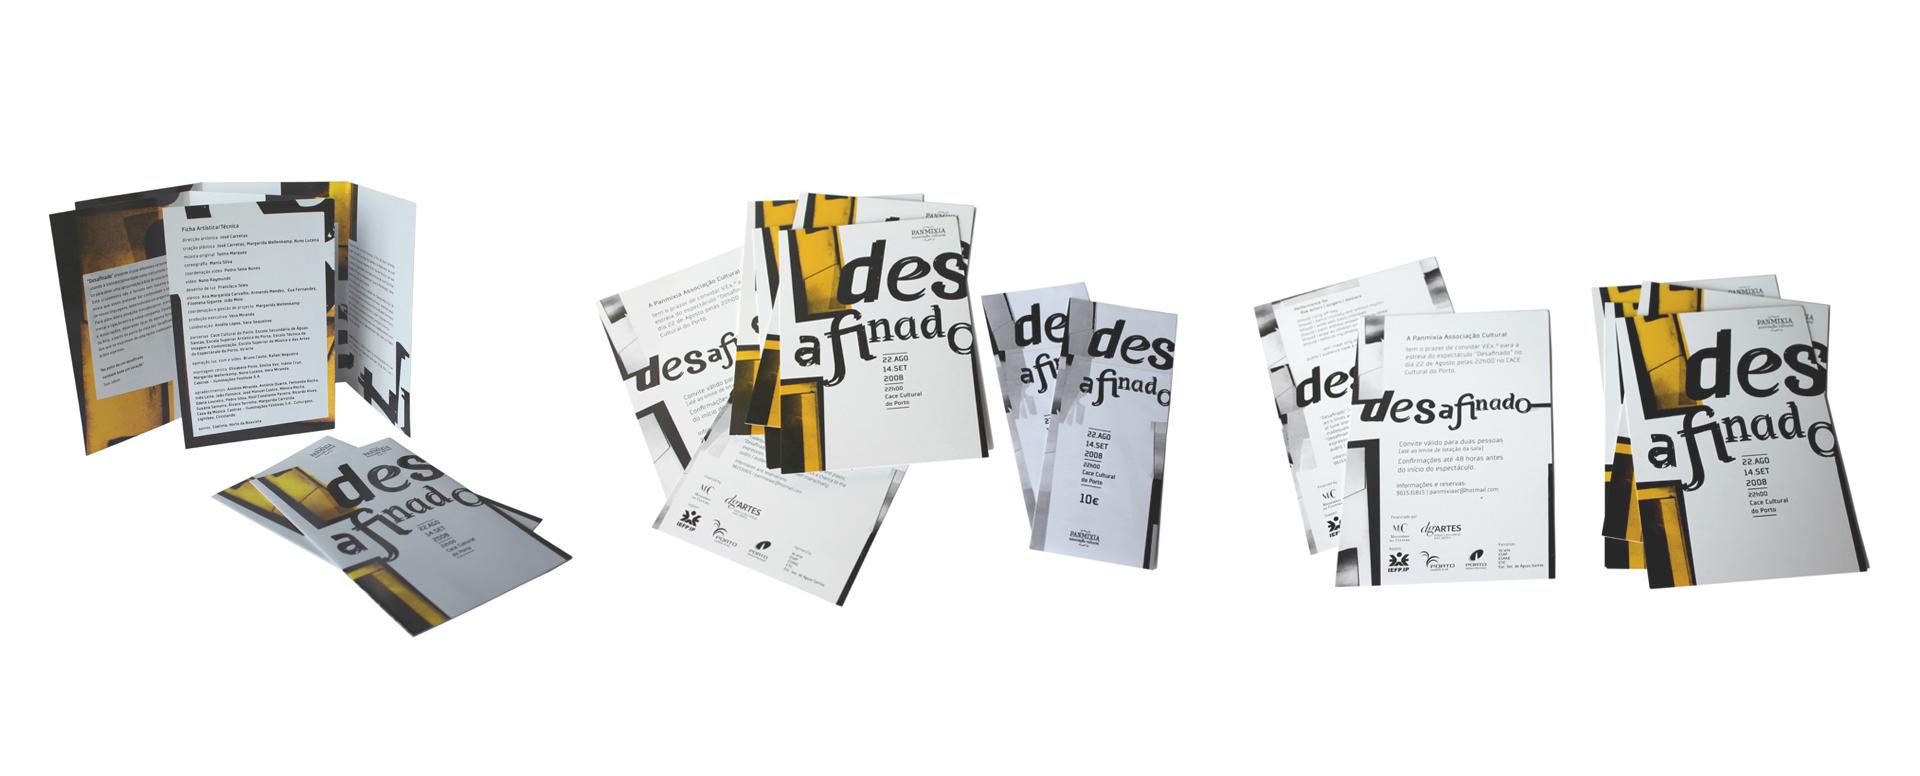 Design-Grafico-Graphic-Design-Cartaz-Poster-Flyer-Desdobravel-Theatre-Play-Handmade-Typography-Tipografia-bonjourmolotov.jpg